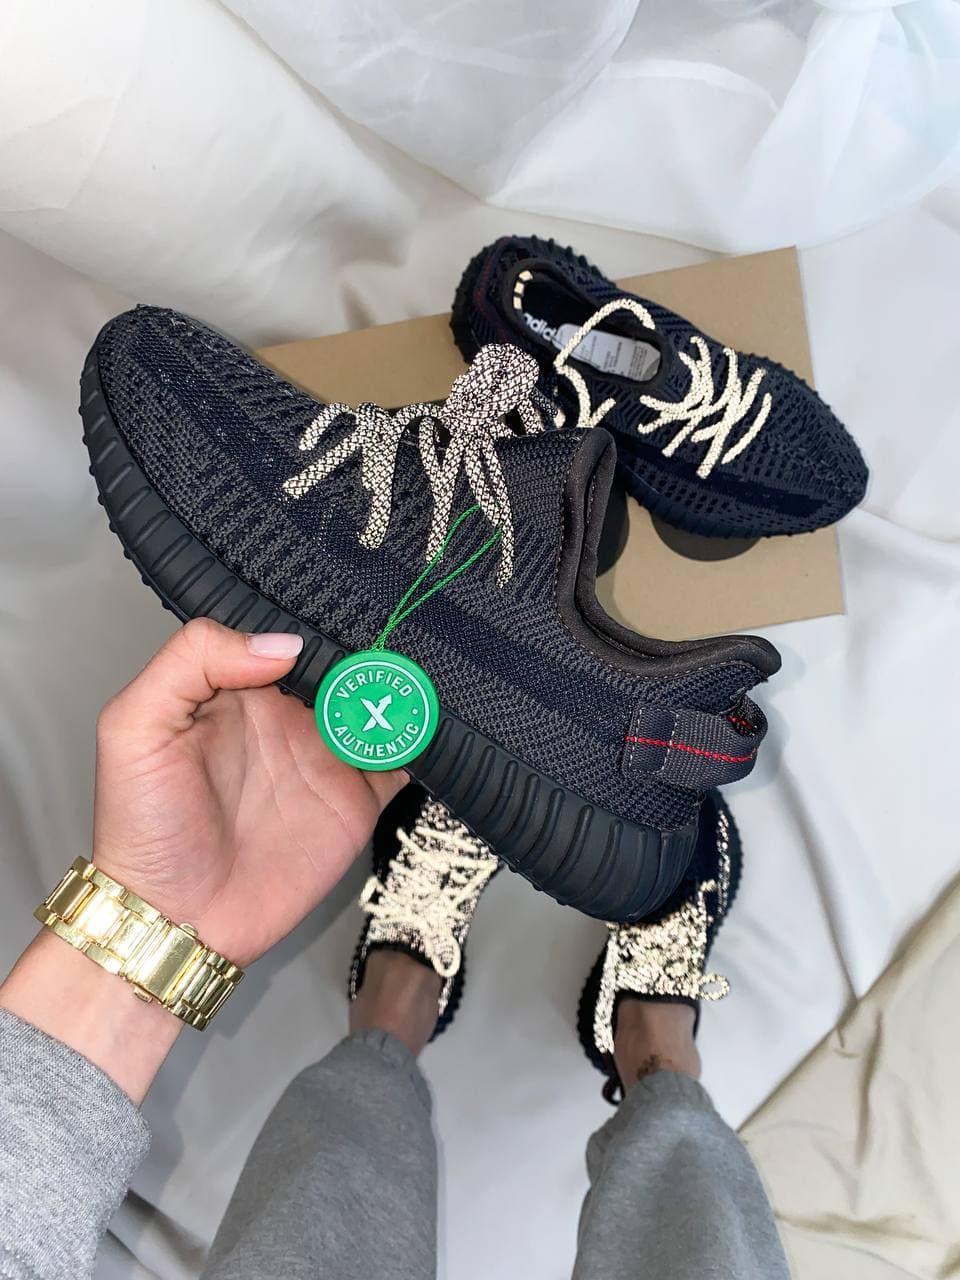 Мужские кроссовки Yeezy Boost 350 Black*(Ref шнурки)